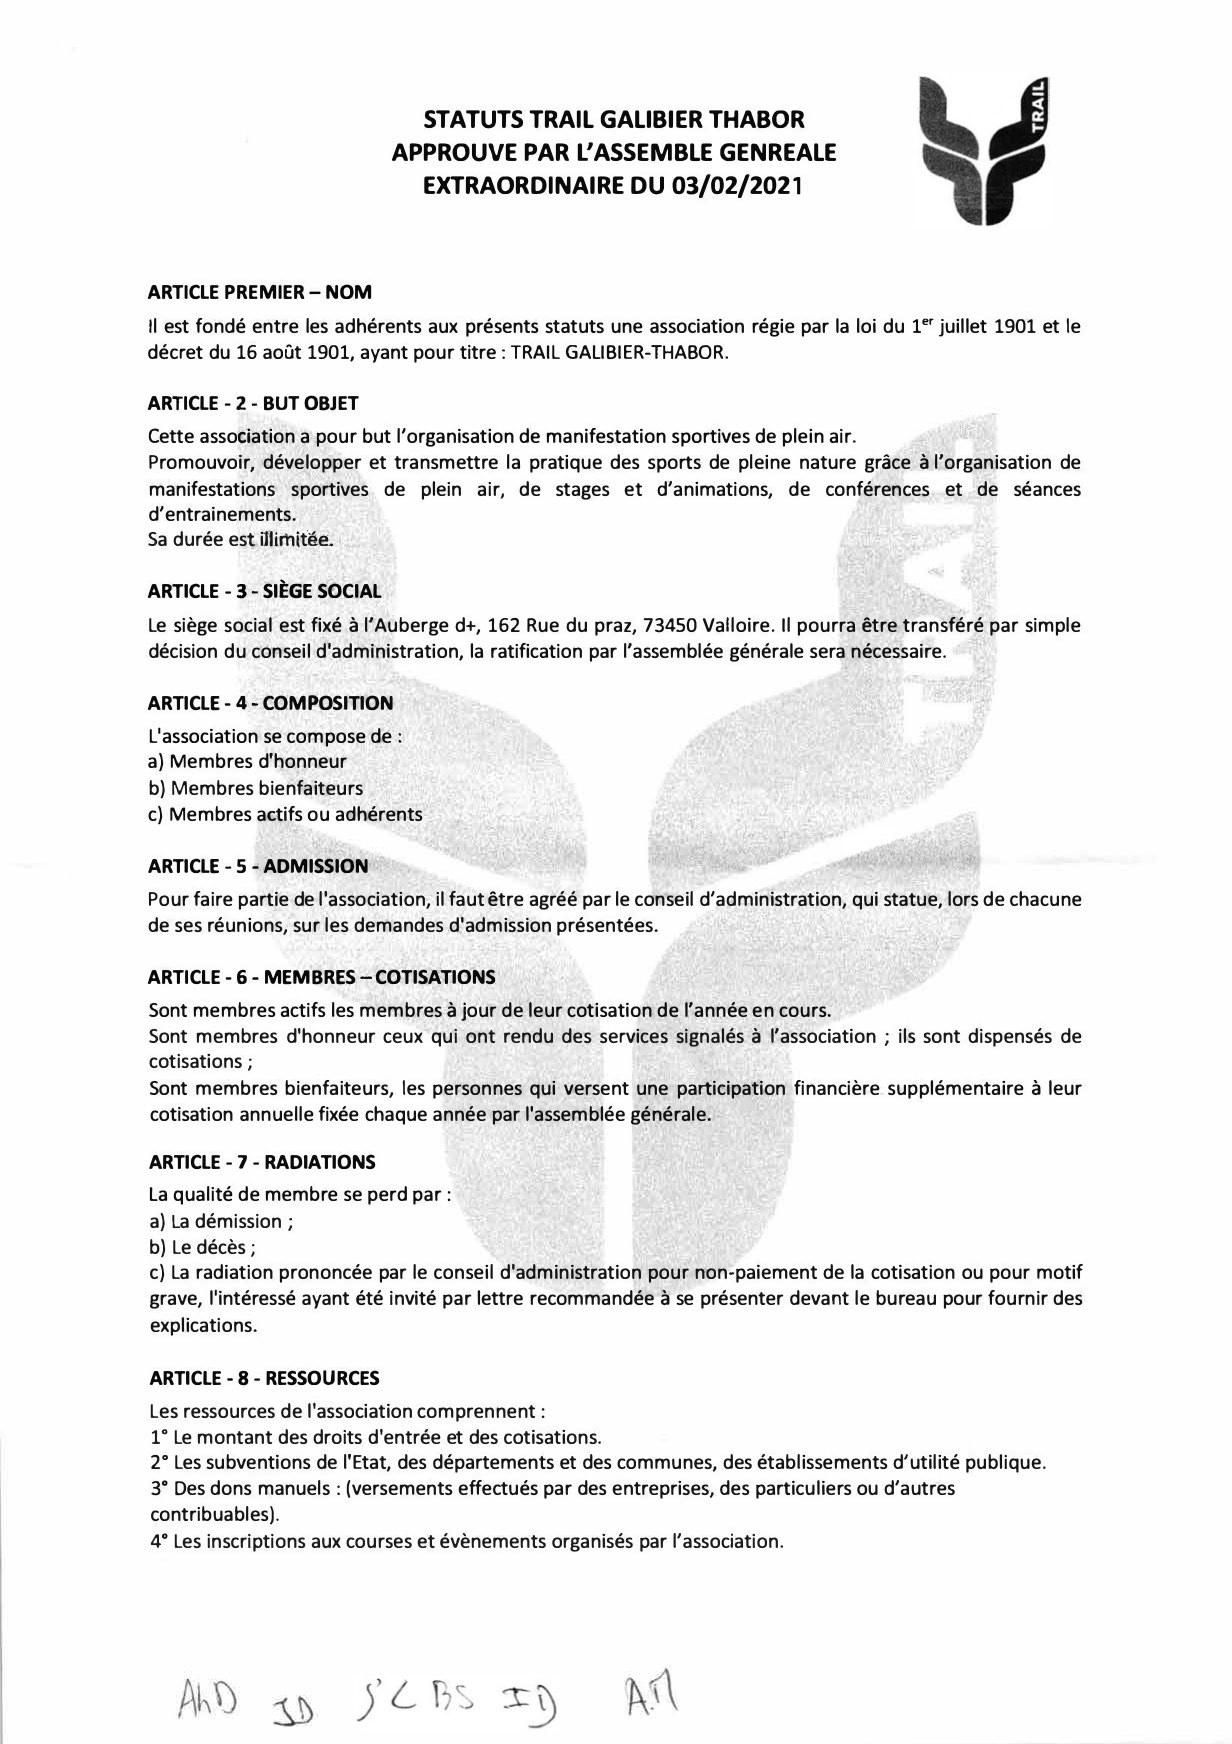 Statuts 2021 Signés